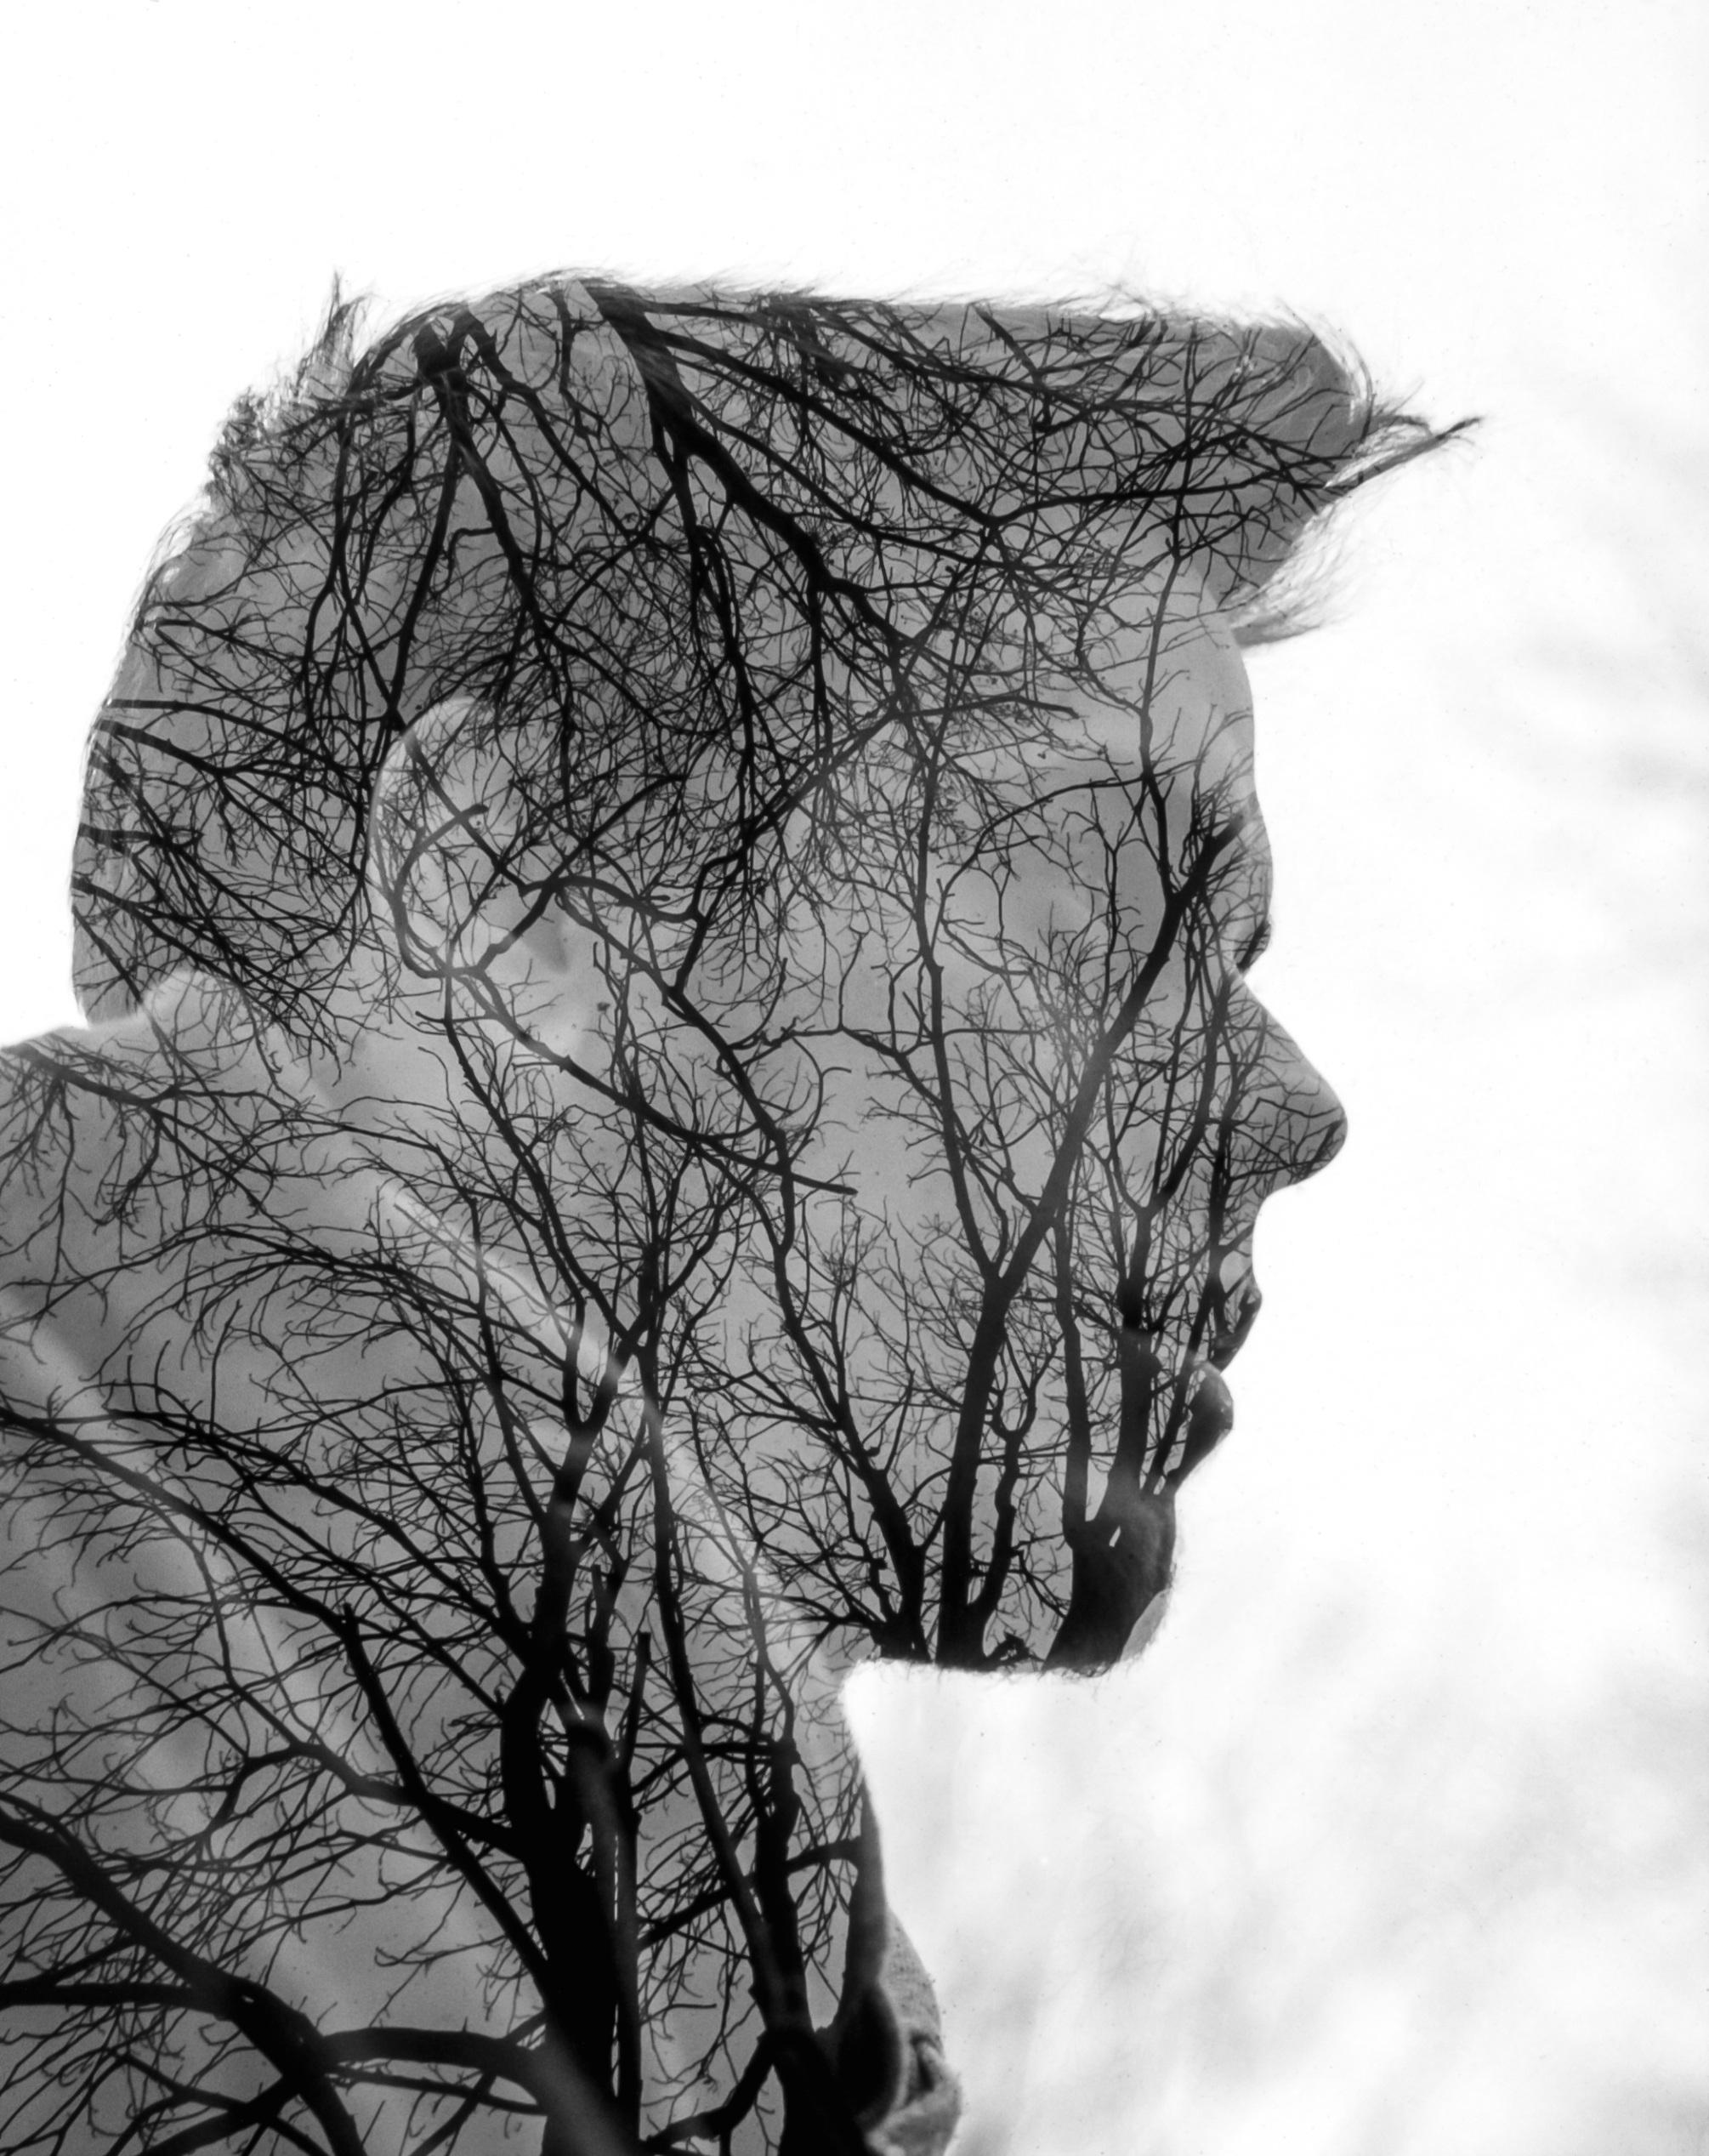 картинки дерево личности отличие тюменских разработчиков